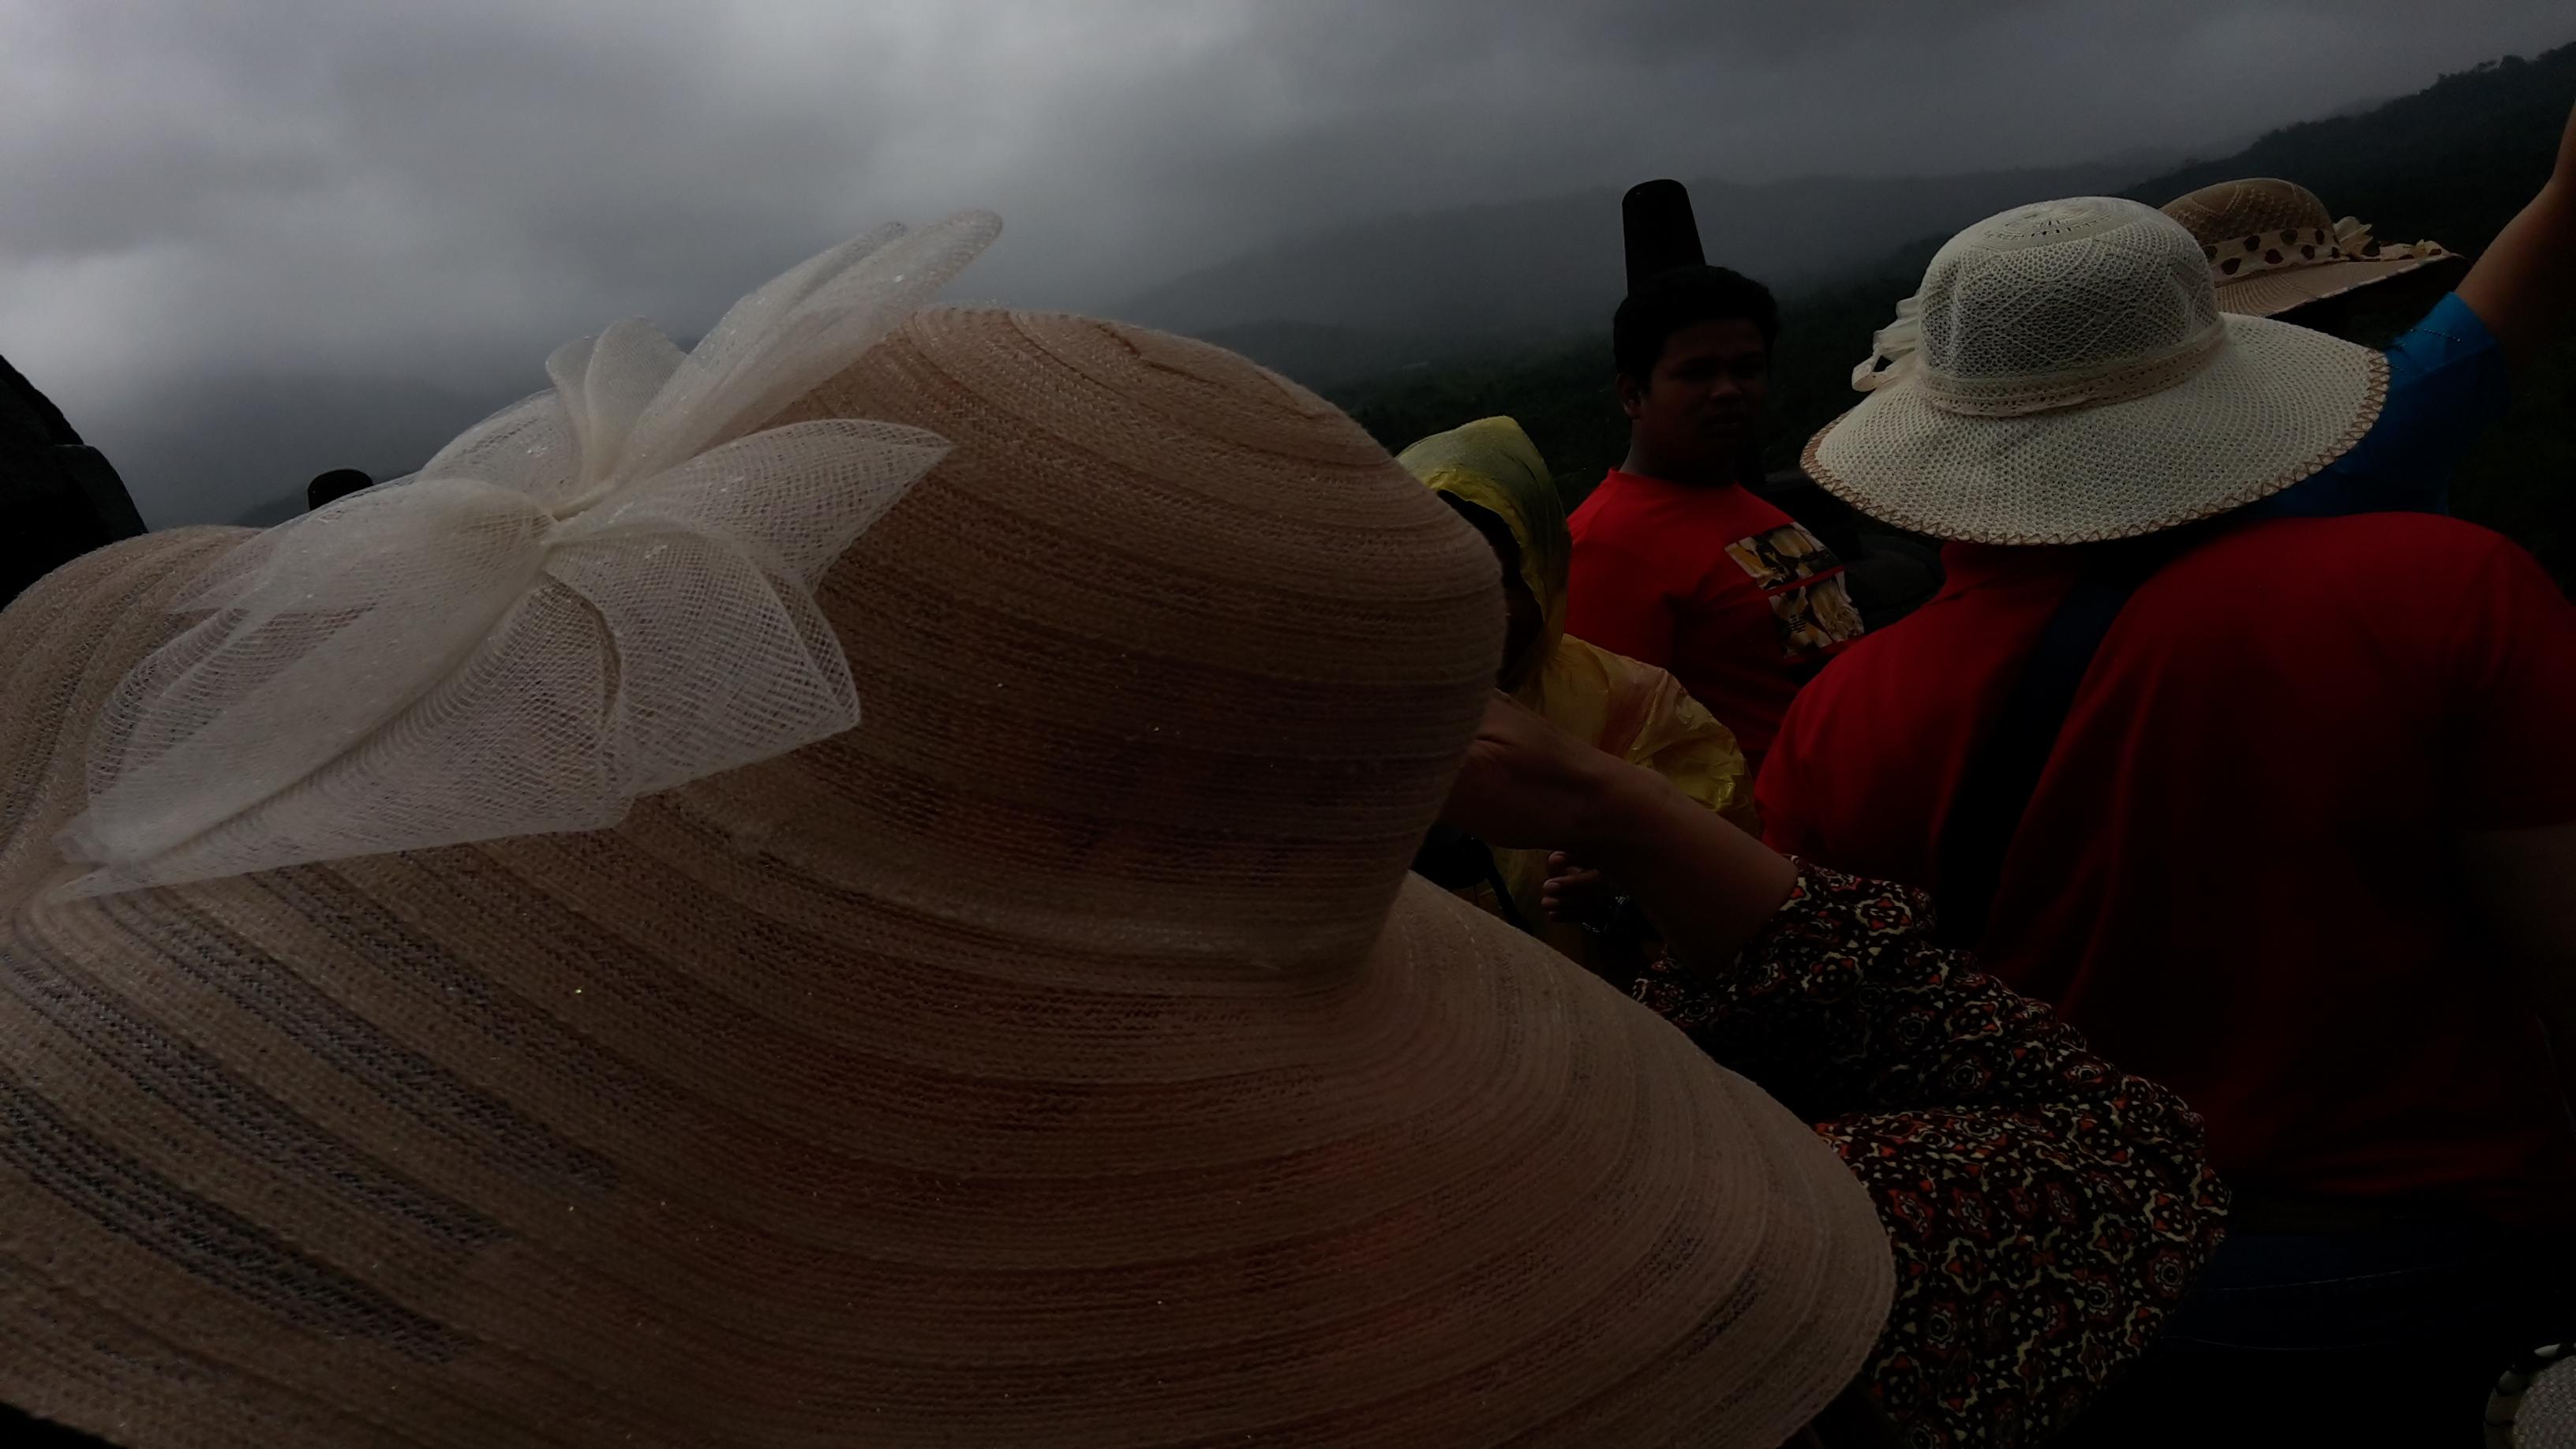 File:Tourist Using Hat, Borobudur Temple, Central Java, Indonesia